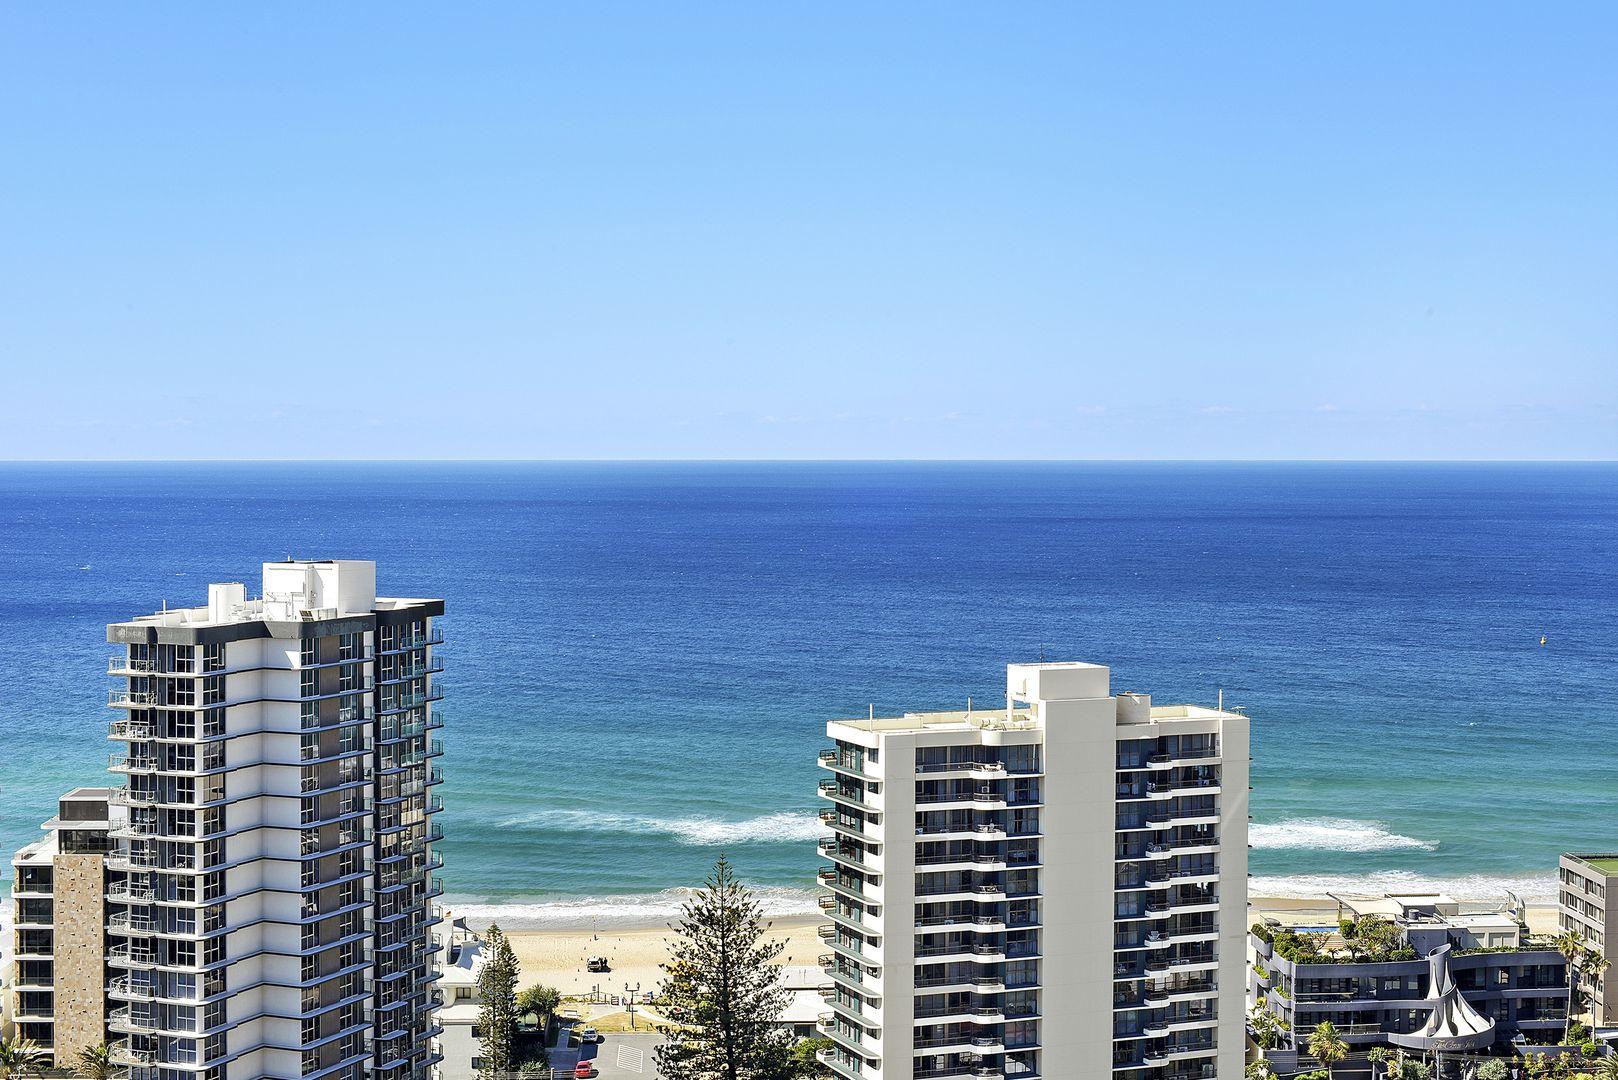 25A/24 Breaker Street, Main Beach QLD 4217, Image 1